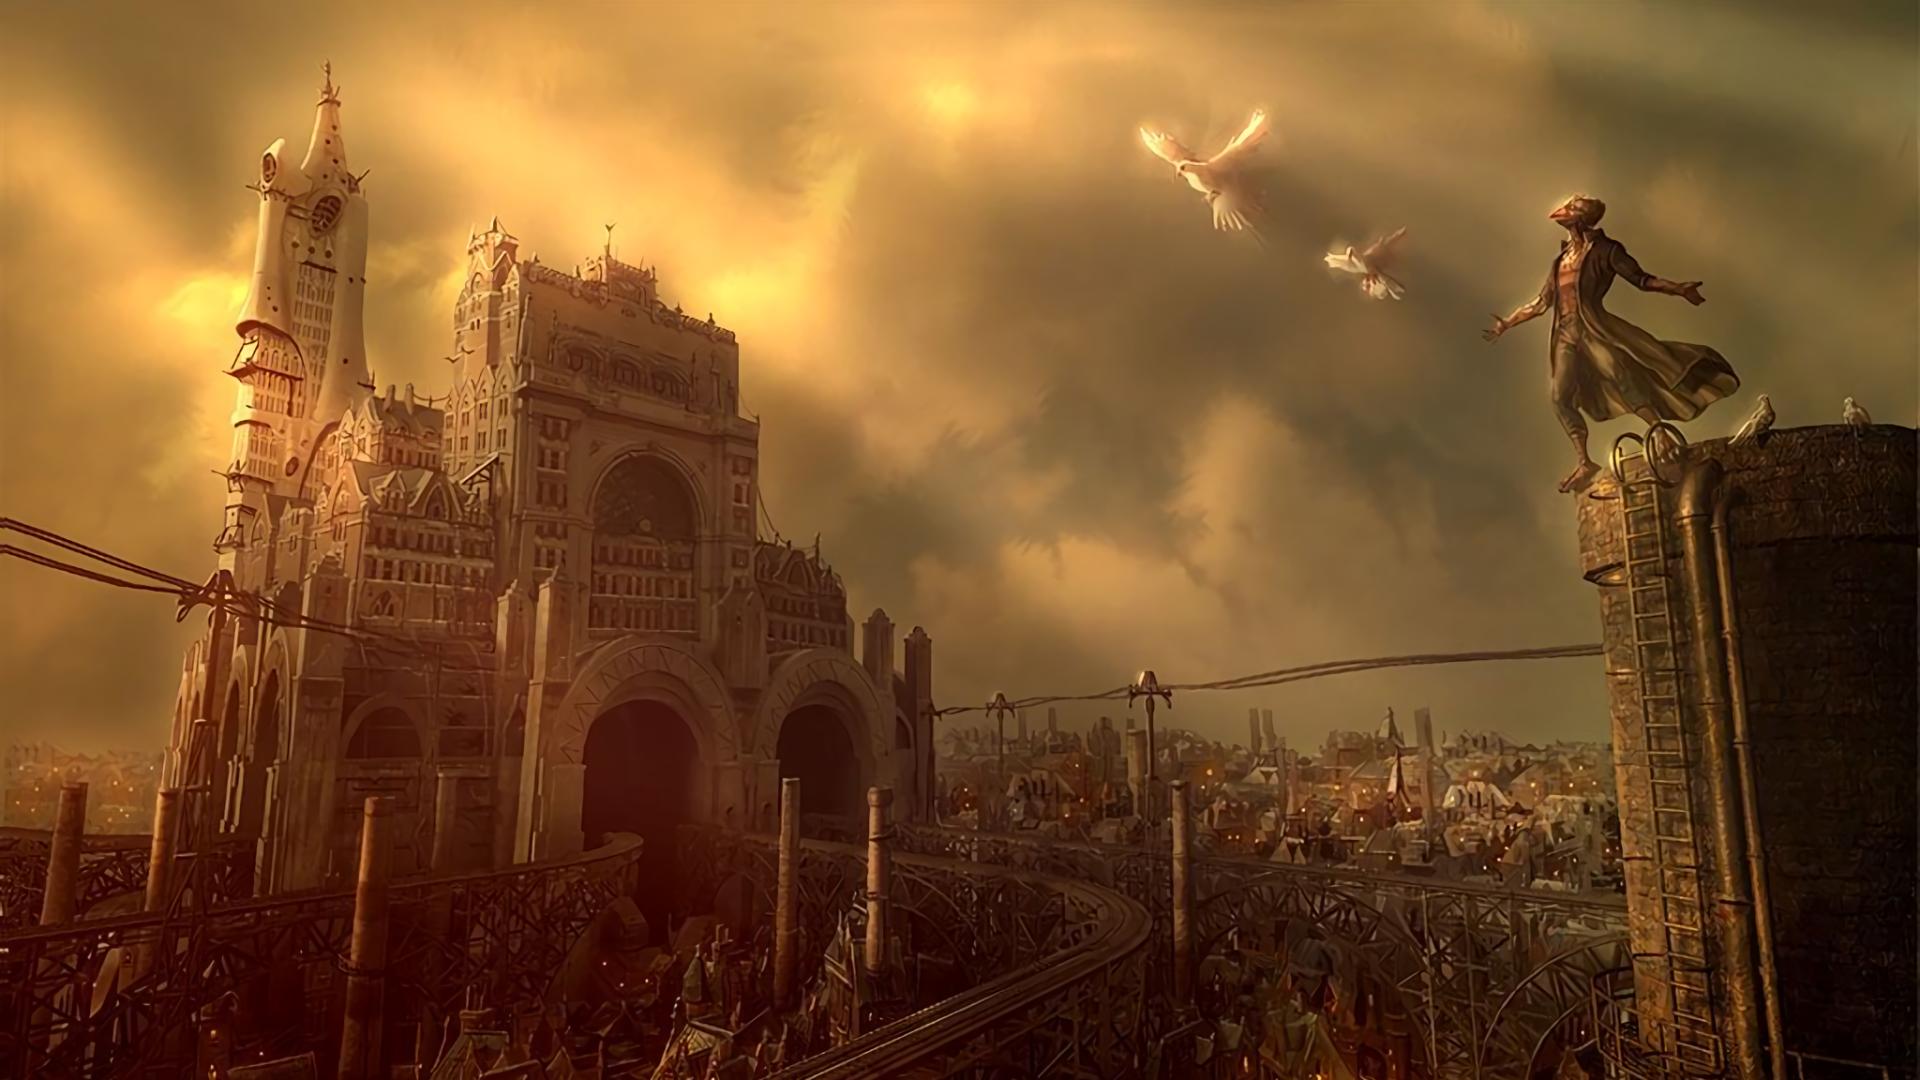 Fantasy - City  Steampunk Wallpaper